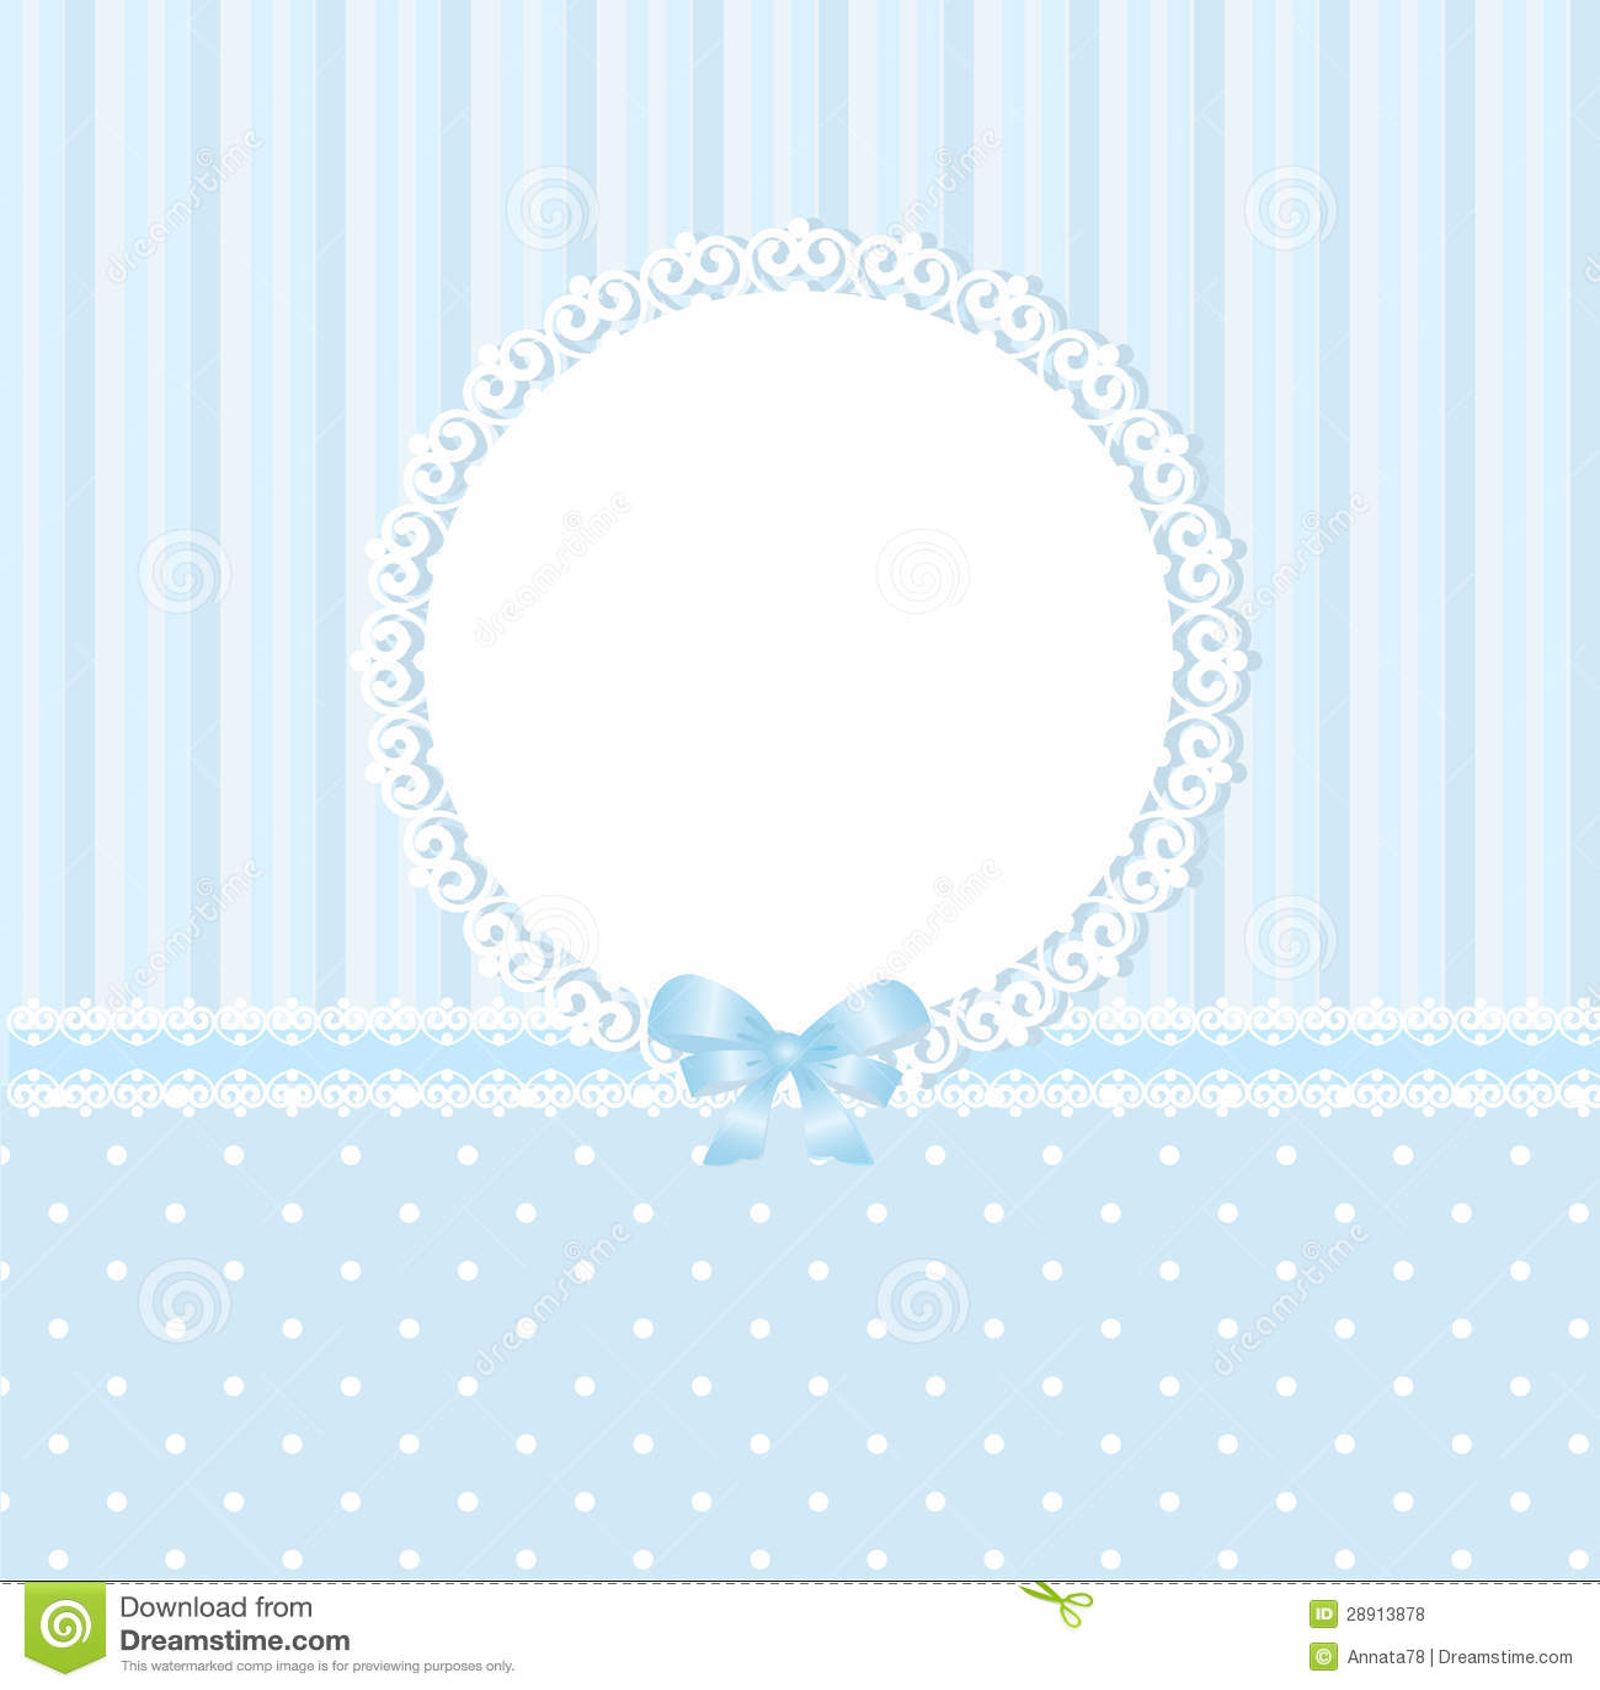 Baby Blue Background Stock Vector Illustration Of Polka